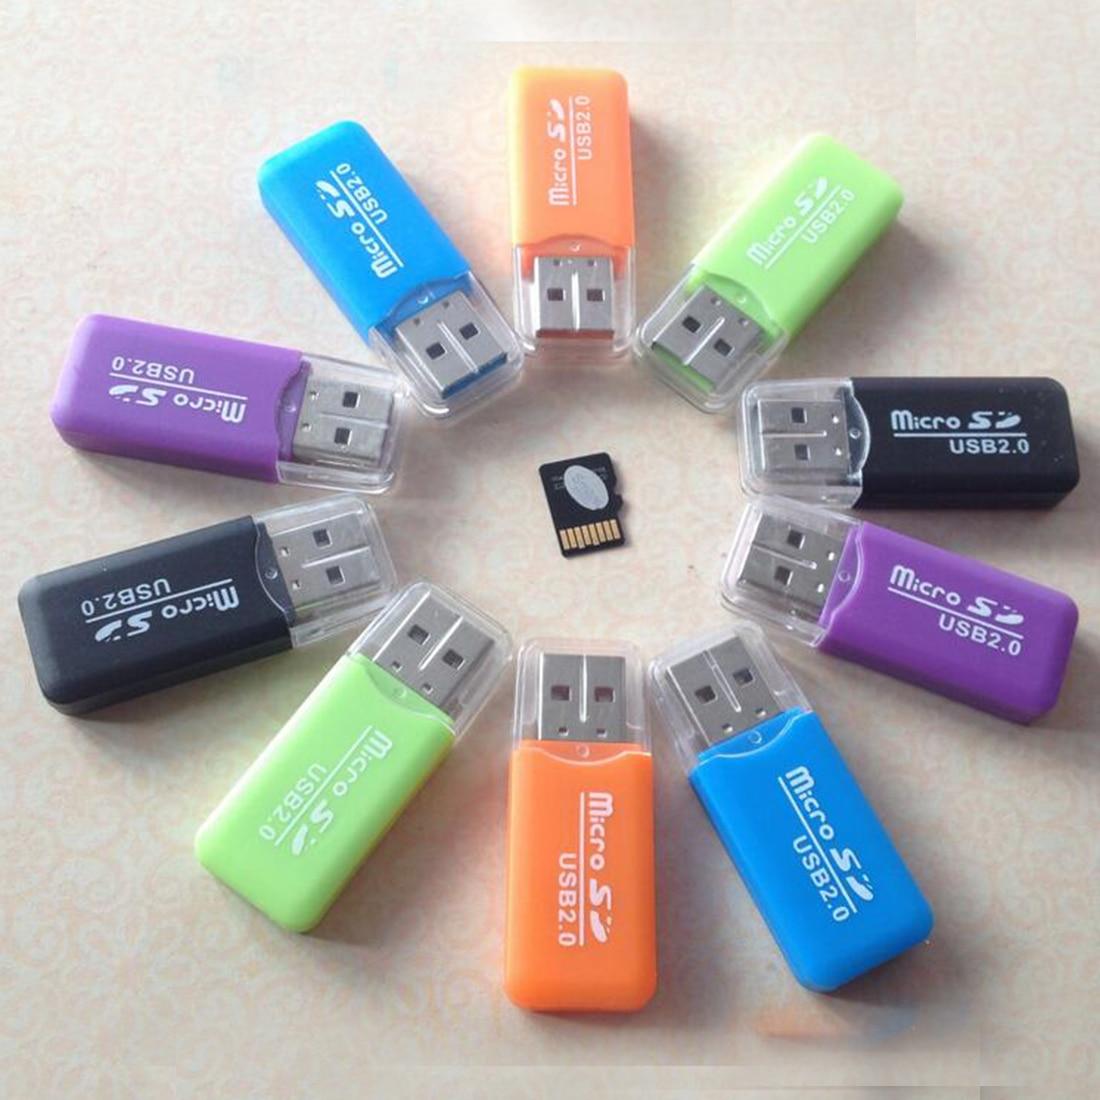 Etmakit   High Qunity Support USB 2.0 Memory Card Reader High Speed Micro SD TF Adapter Random Color